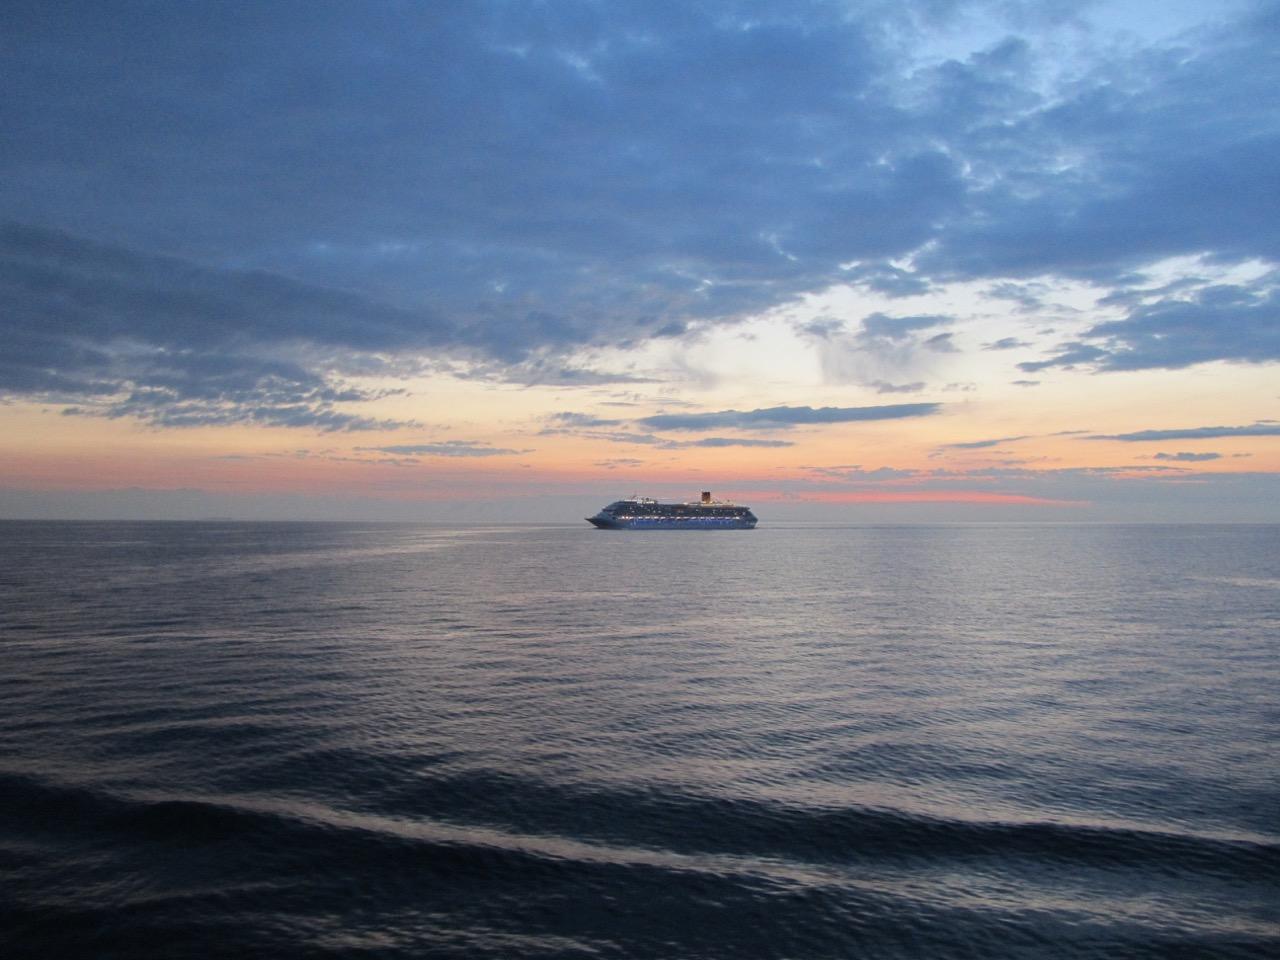 Midnight Sun & ship